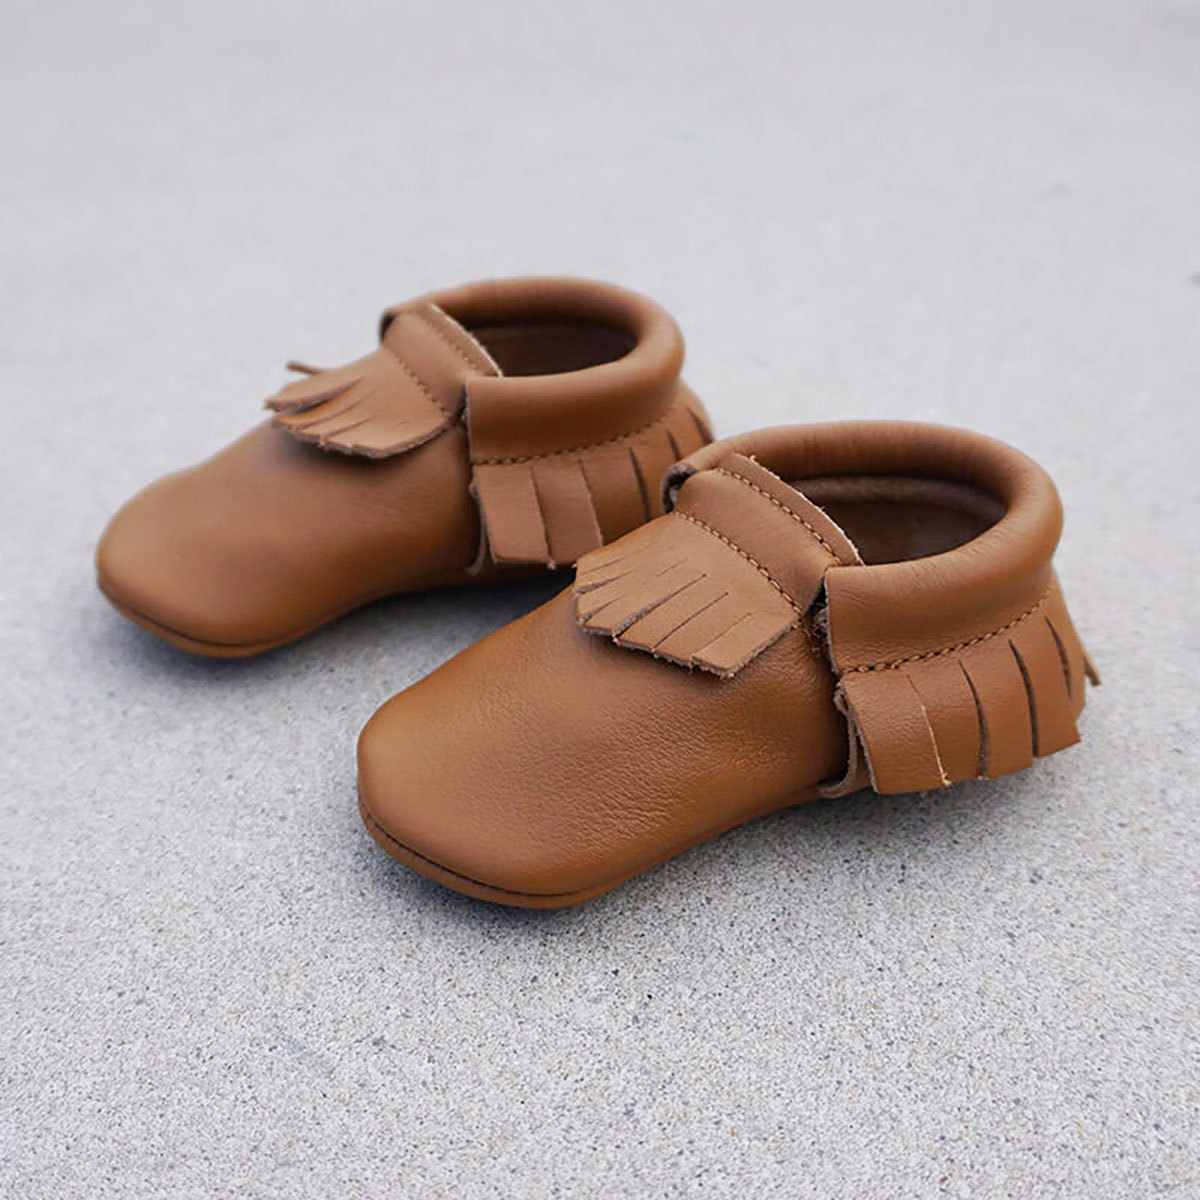 Chaussons & Chaussures Mocassins Camel - 17 Mocassins Camel - 17